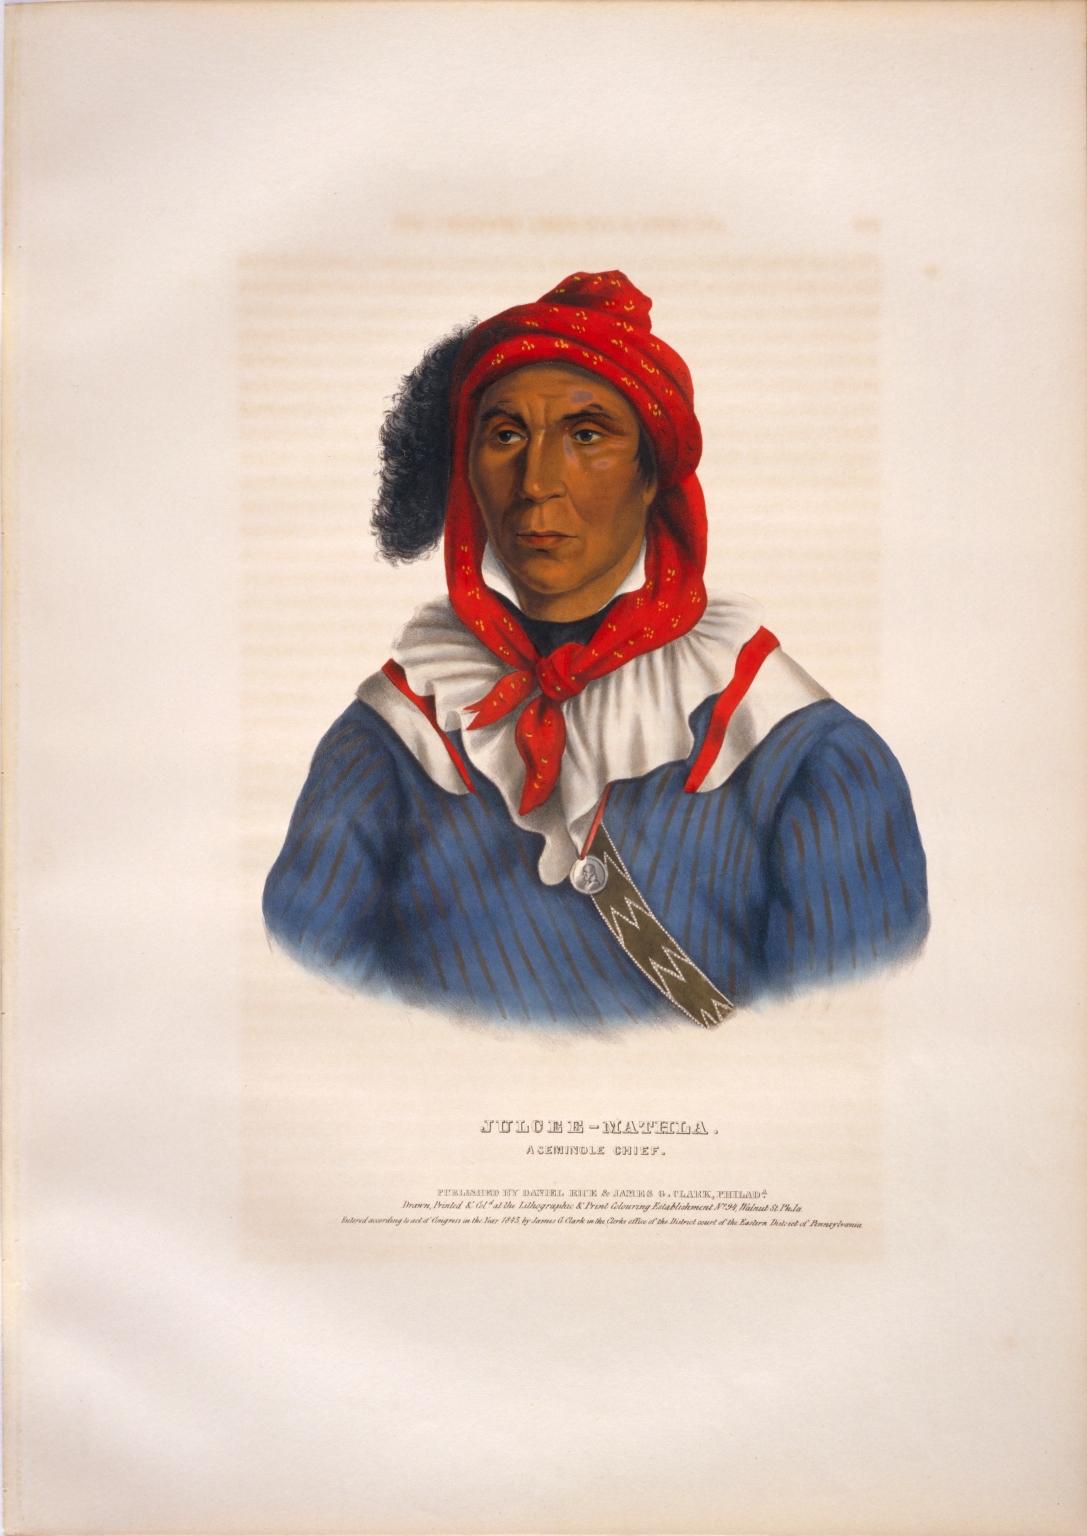 Julcee-Mathla, a Seminole chief